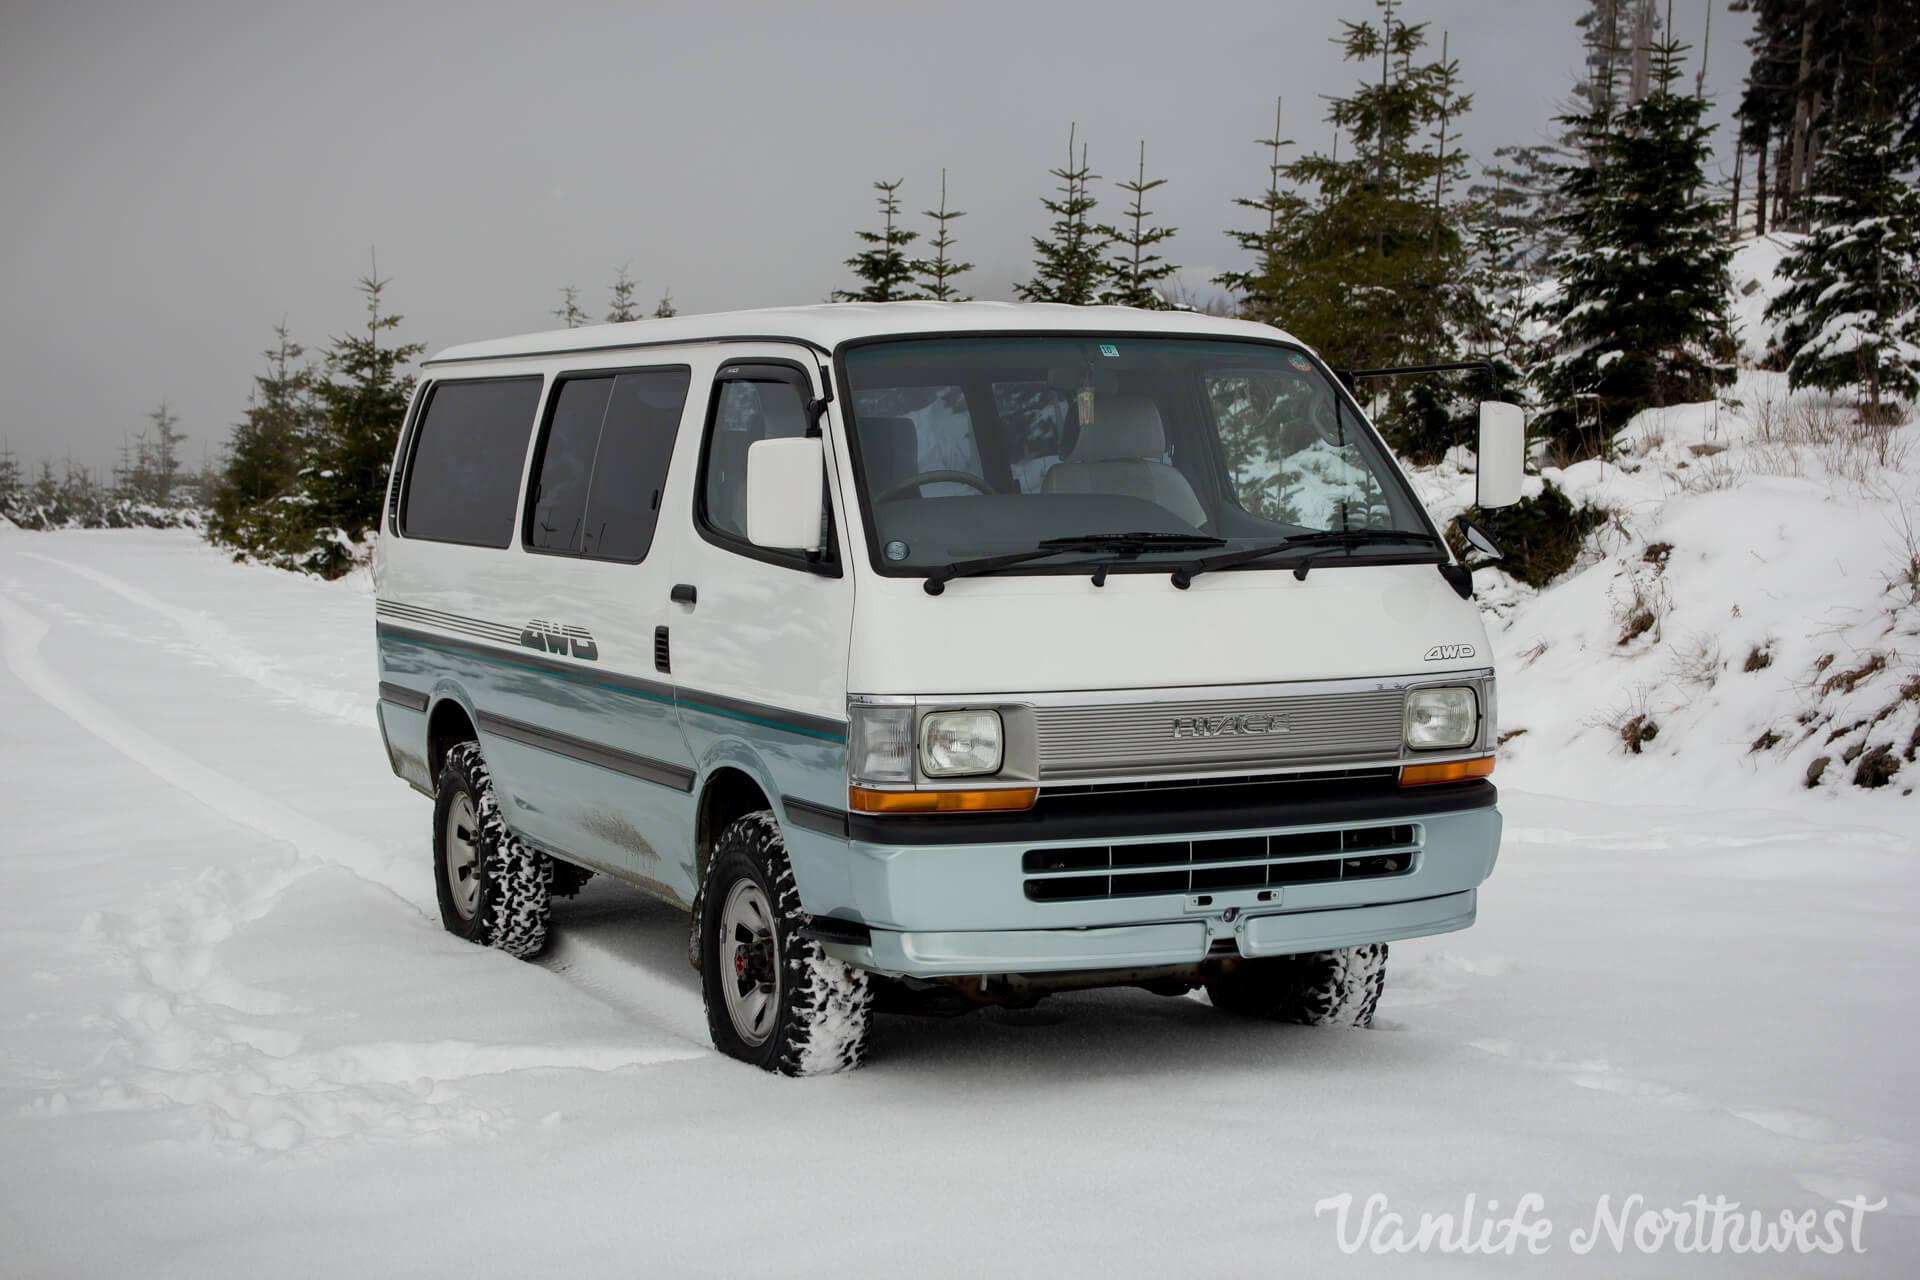 ToyotaHiaceLH119-JoeH-22.jpg